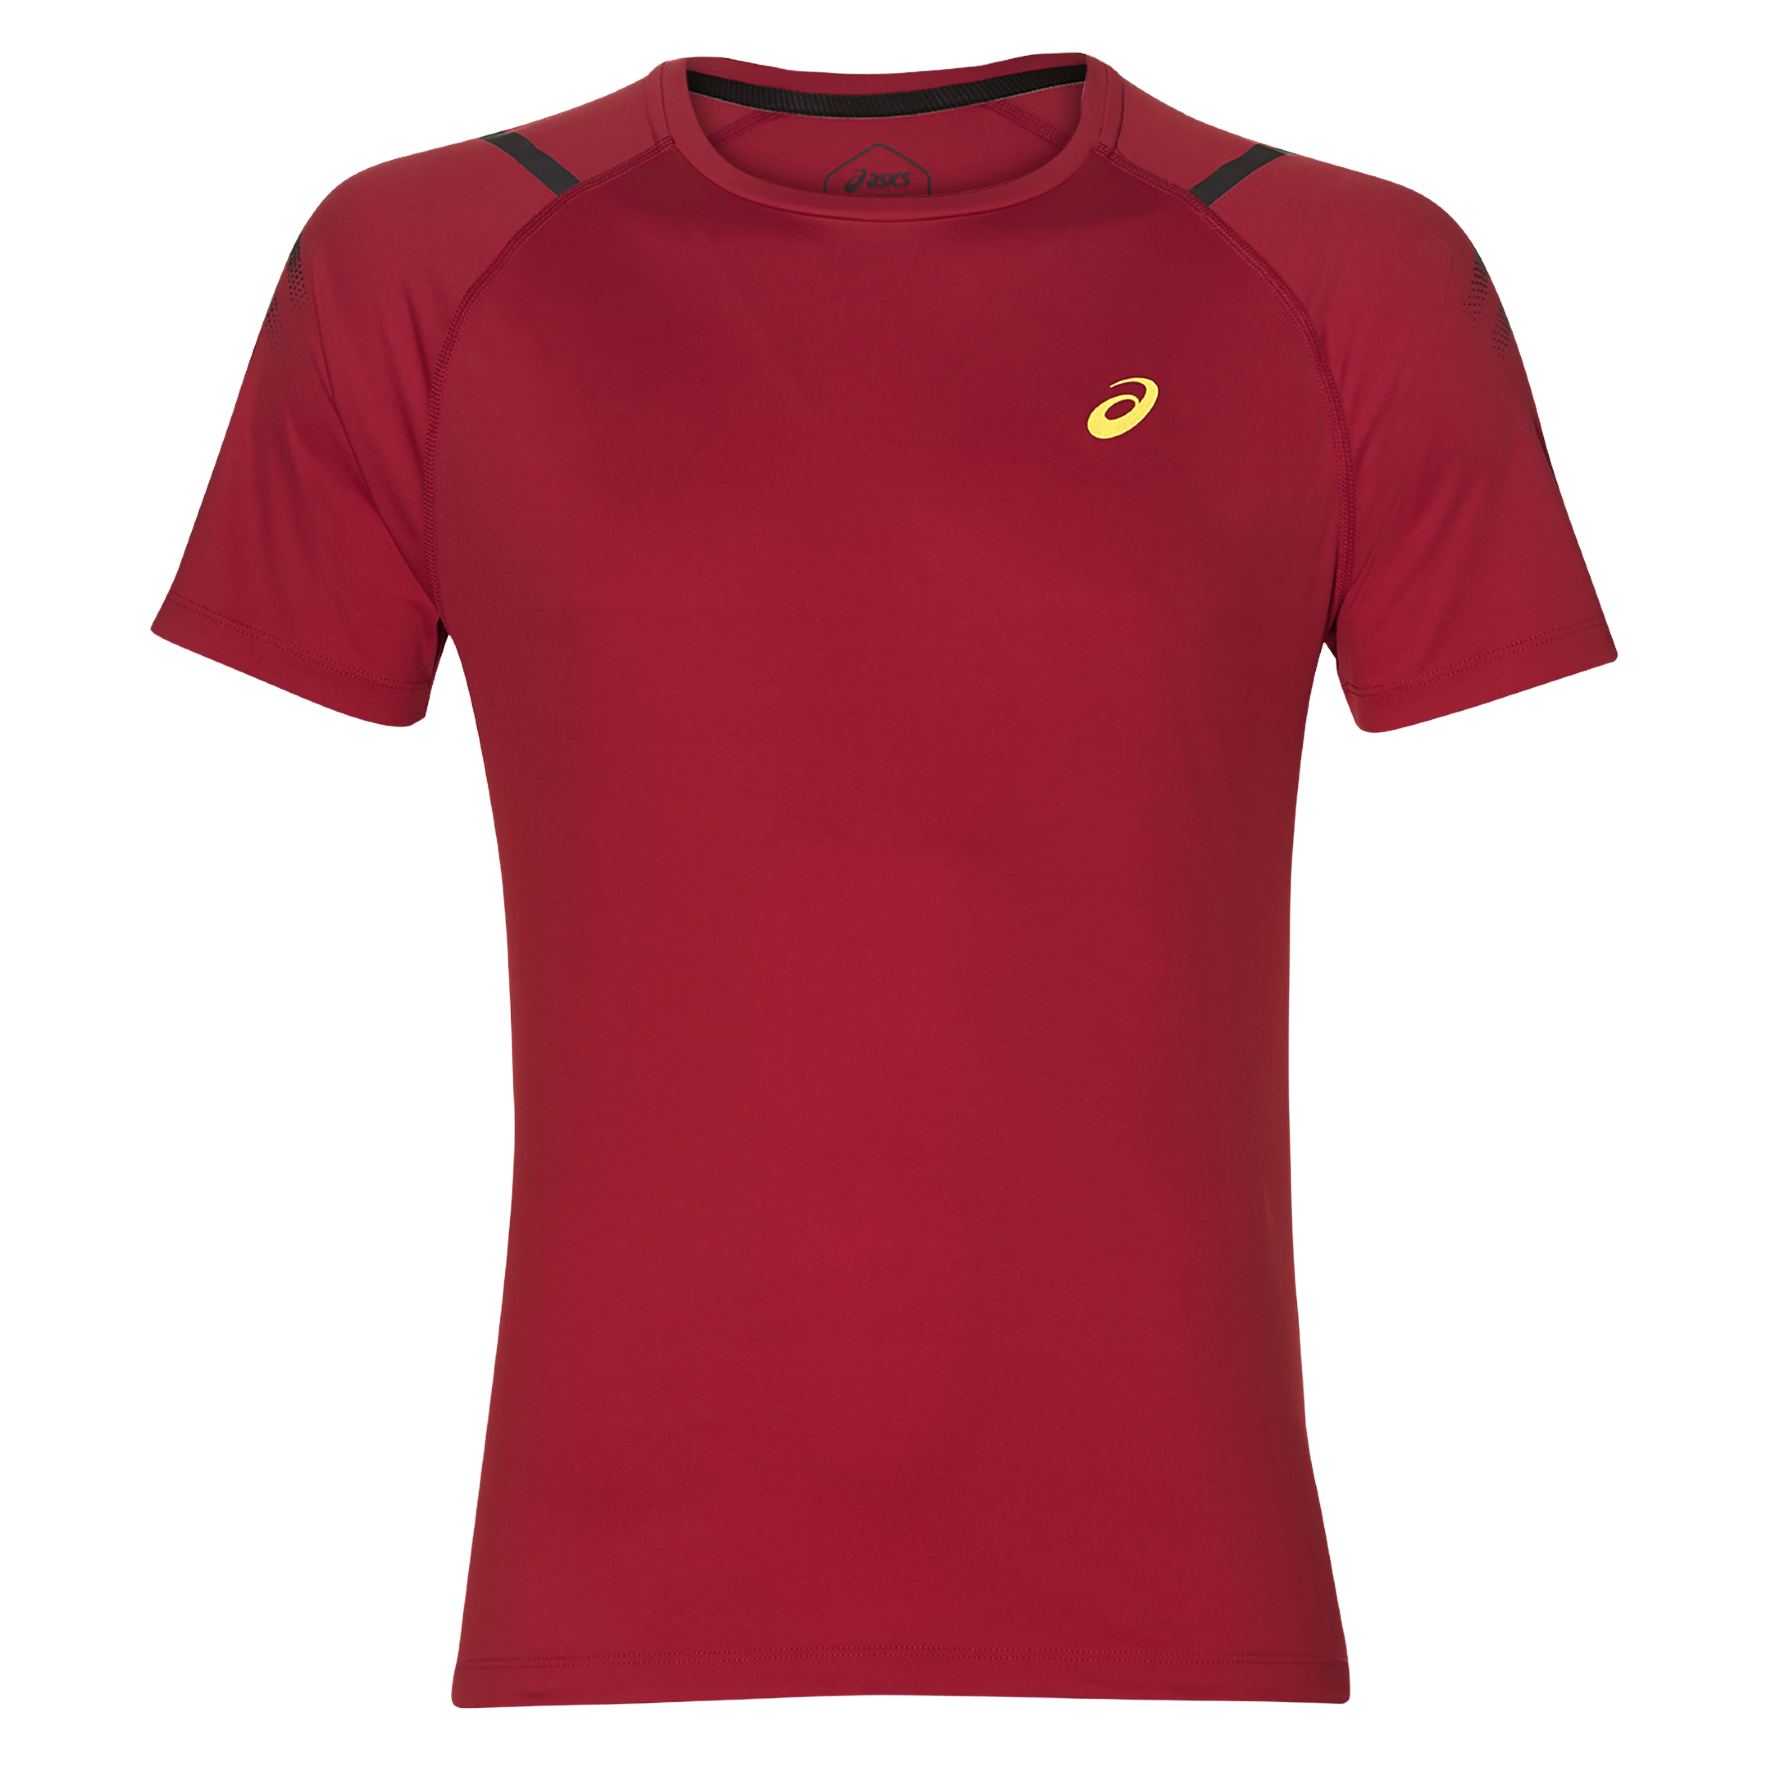 Asics 2011A259, moška tekaška majica, rdeča